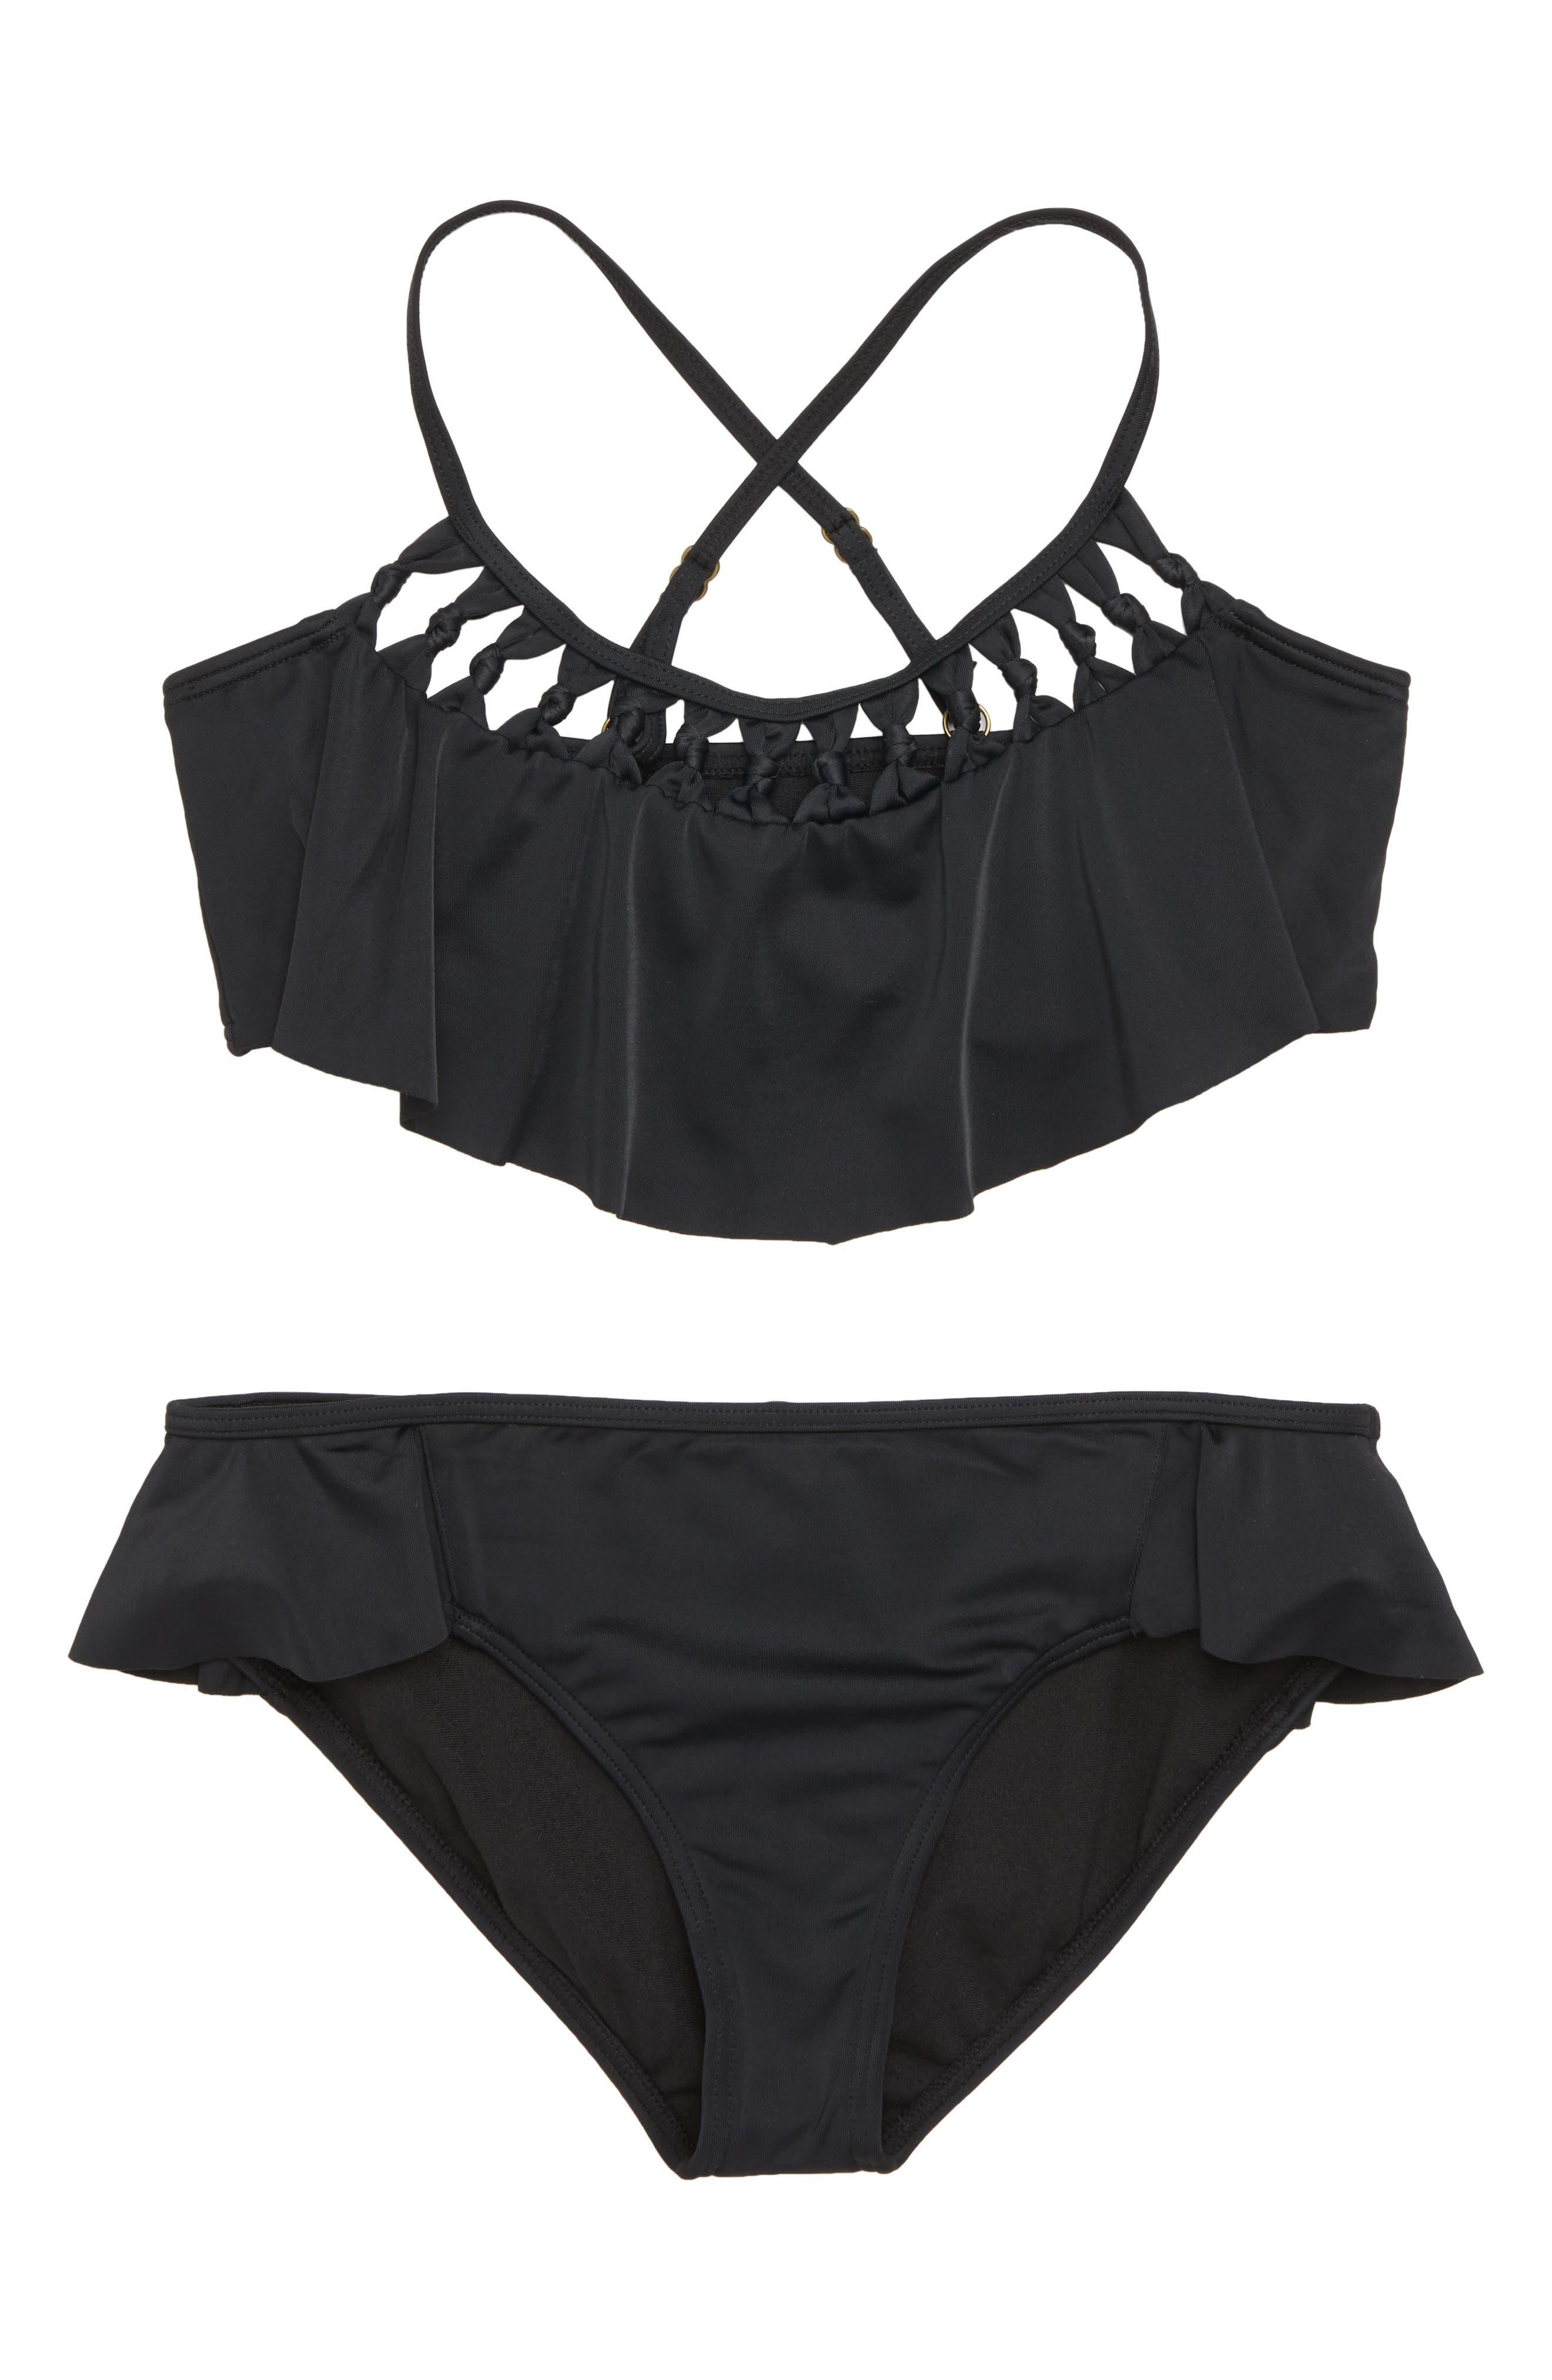 Macramé Madness Two-Piece Swimsuit,                             Main thumbnail 1, color,                             Black